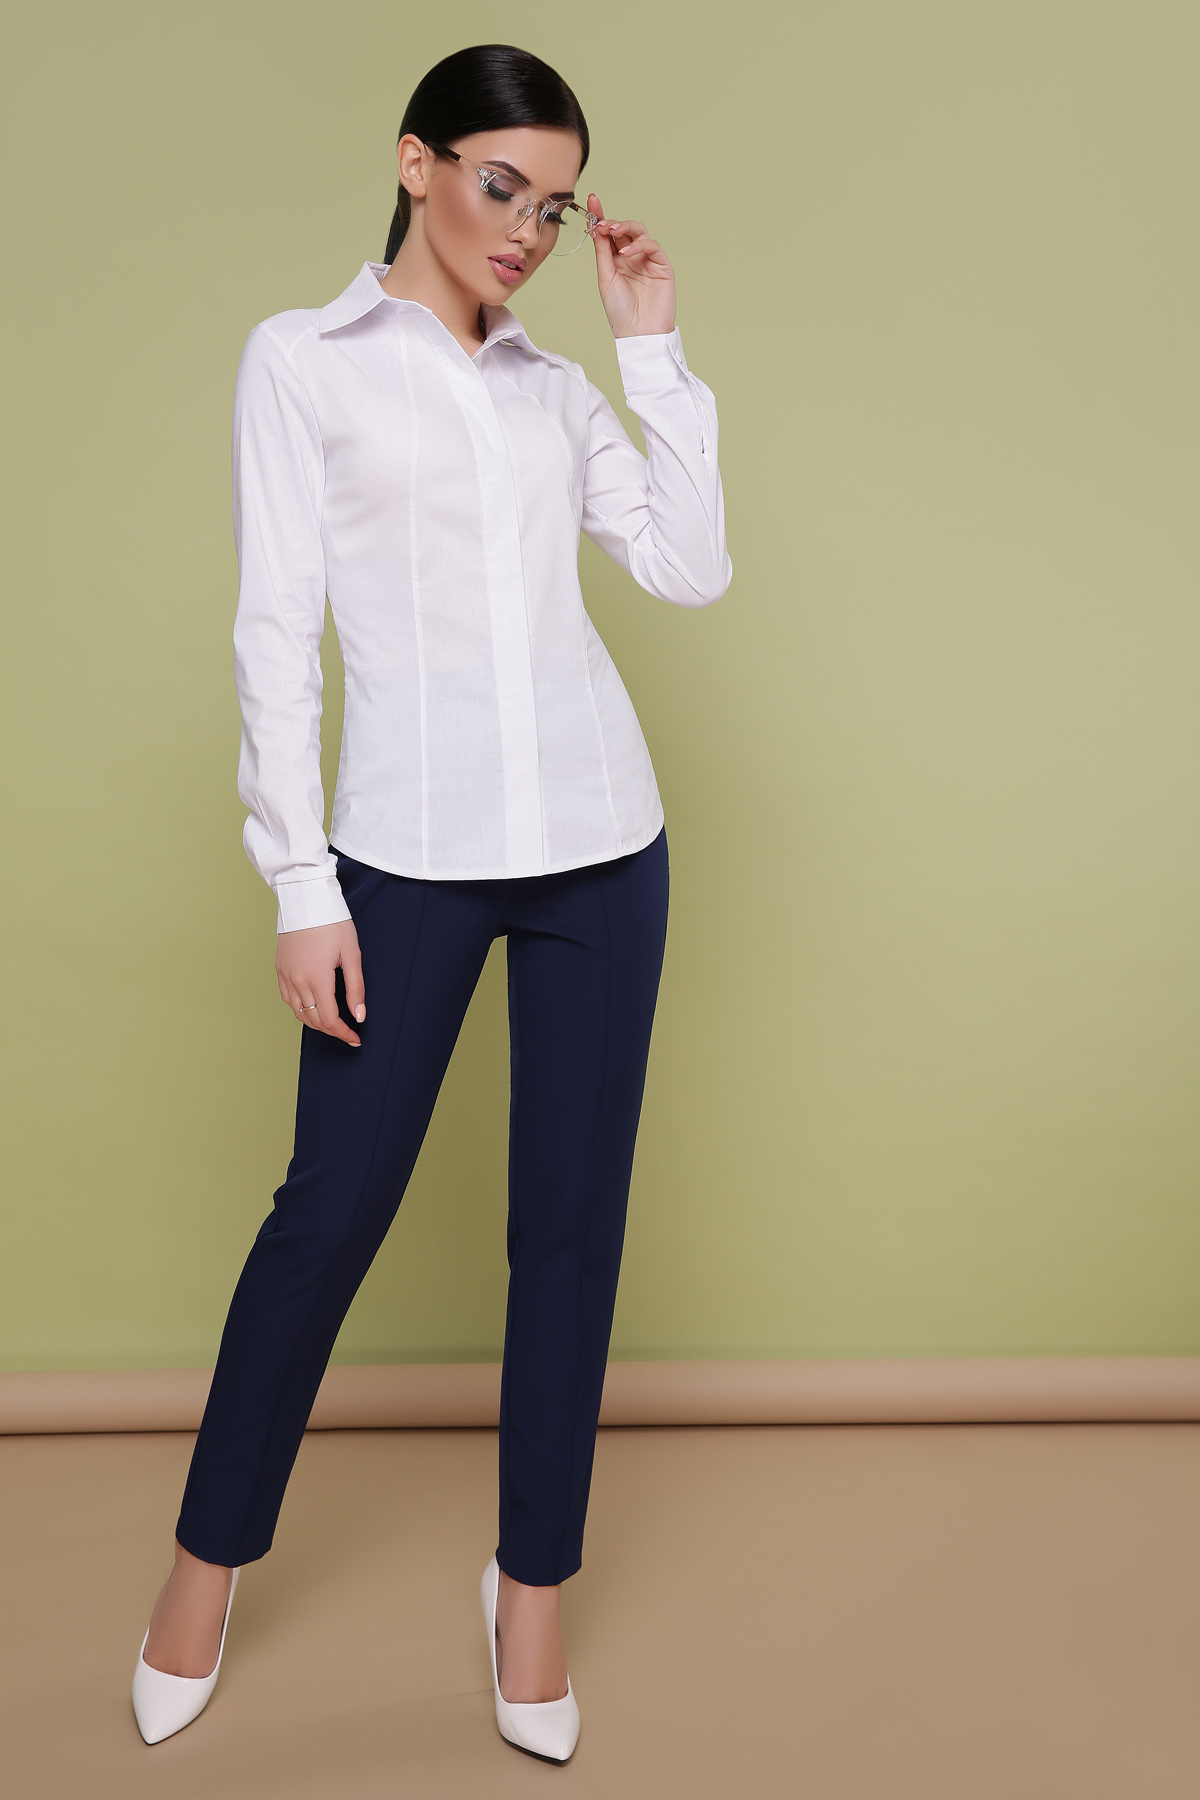 179d0c79a4e Деловая женская блузка темно-синего цвета. блуза Норма д р.